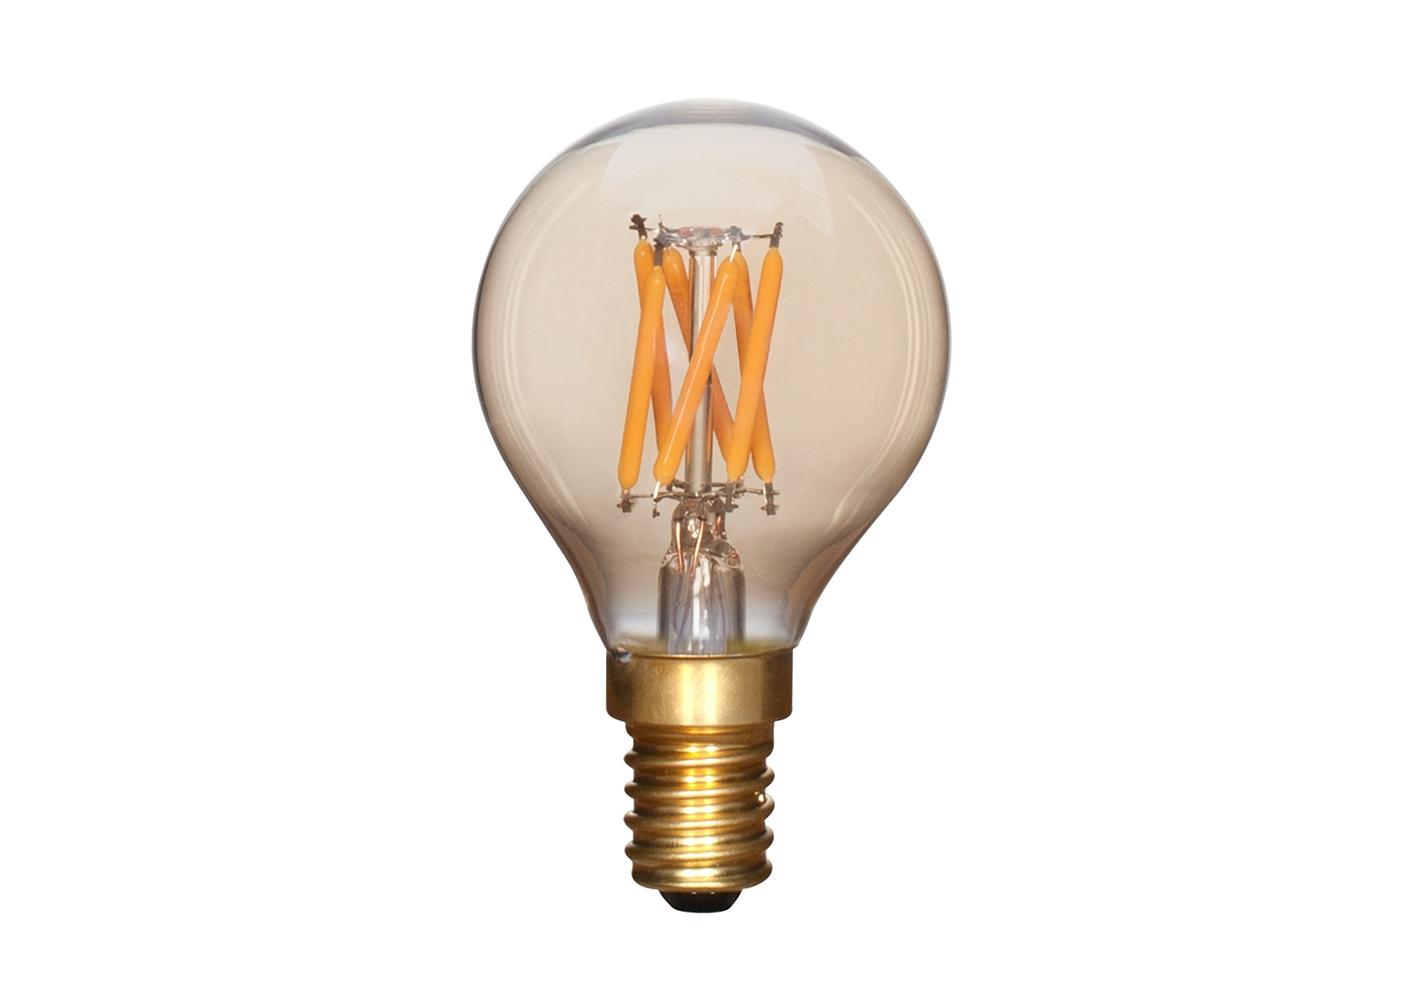 Ampoule Pluto 3 watt - TALALED